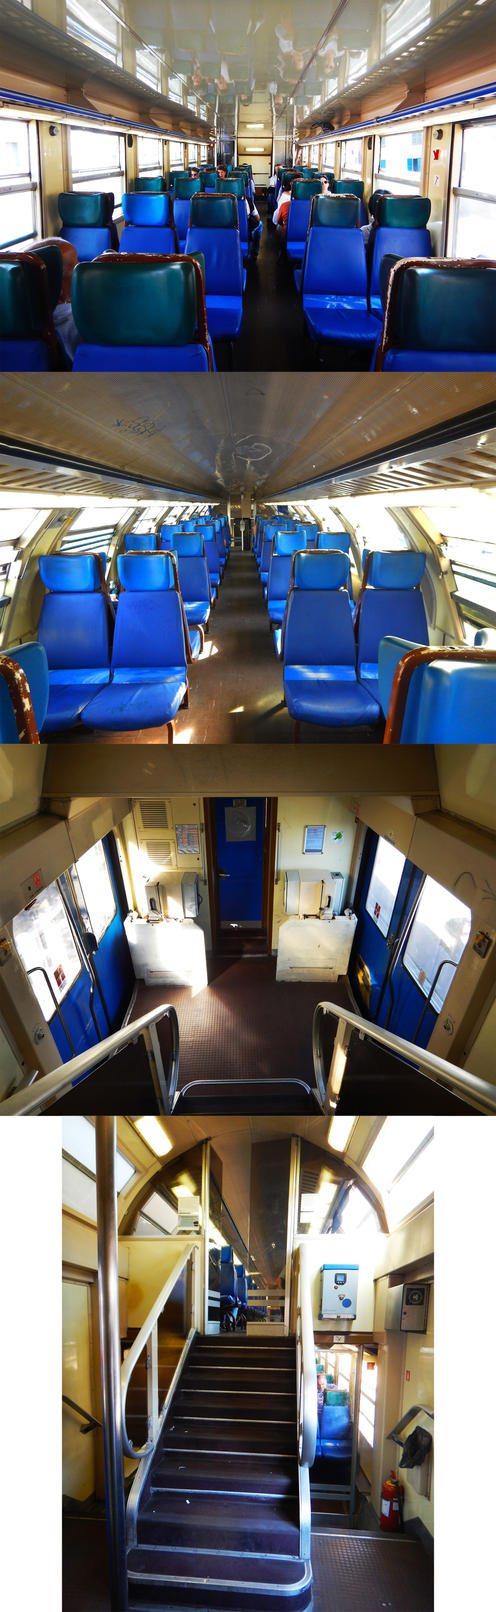 old trains trams cable cars by gladiatorromanus on deviantart. Black Bedroom Furniture Sets. Home Design Ideas